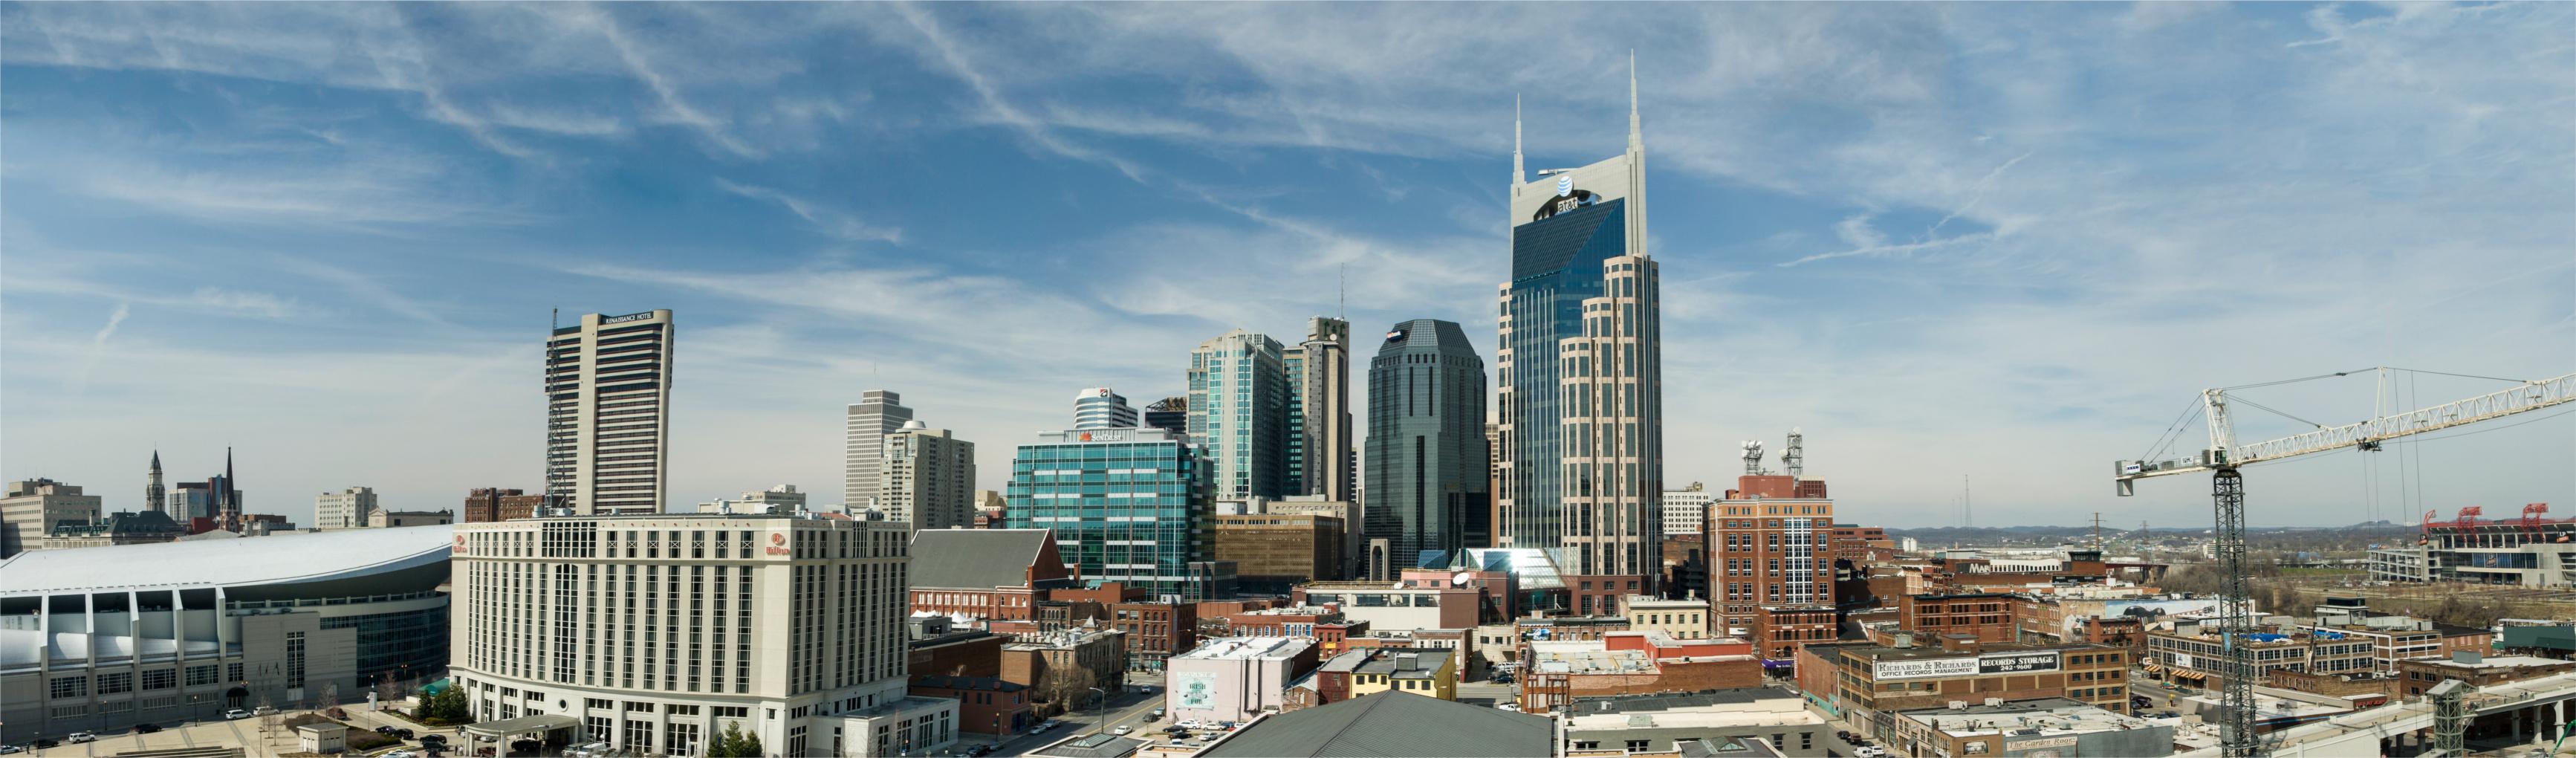 Nashville tn dating service